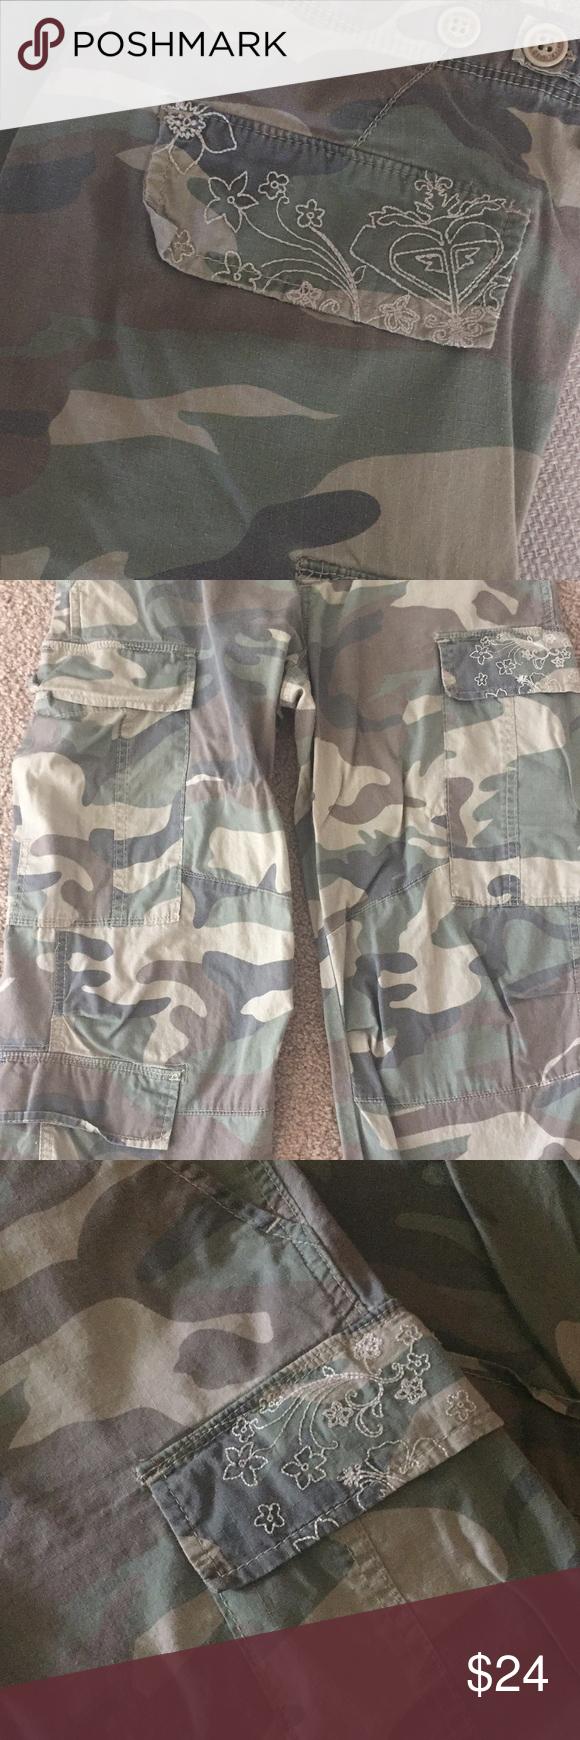 Roxy Cute comfy cargo camouflage pants. Size 31 inch waist Roxy Pants #woodyandbobeep